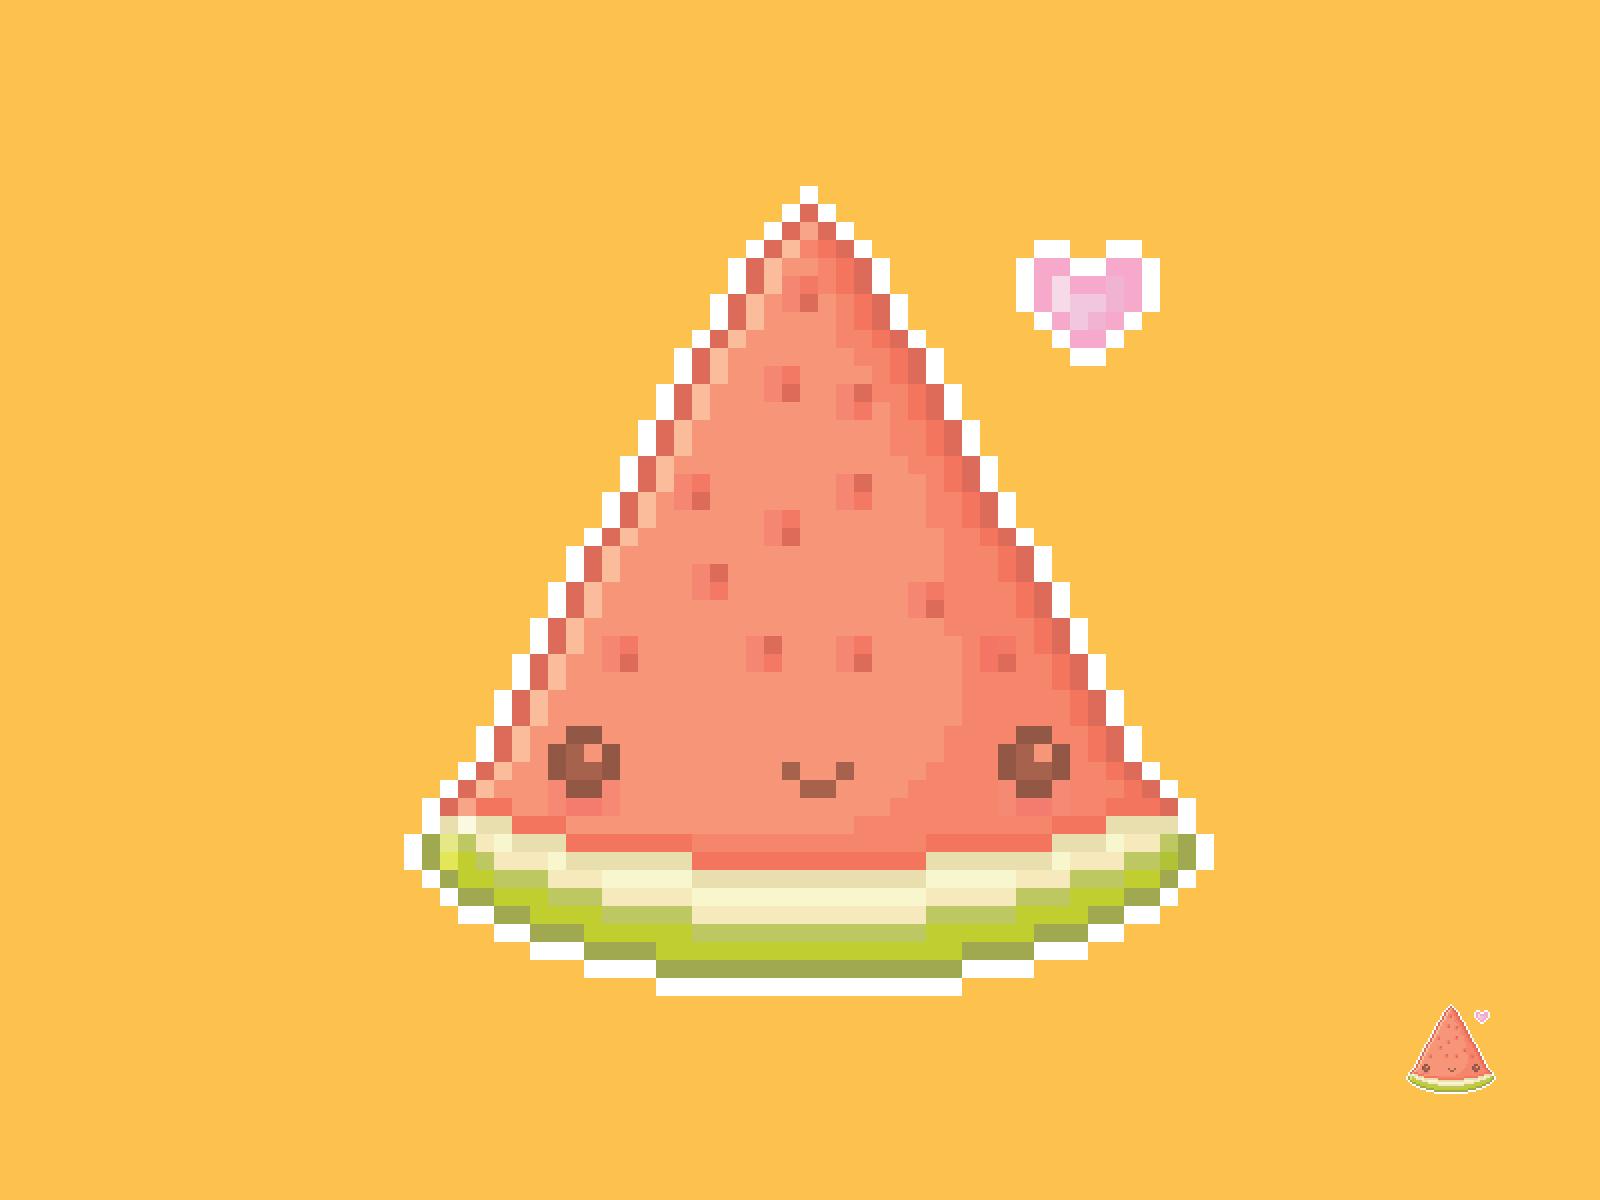 Cute Kawaii Watermelon Pixel